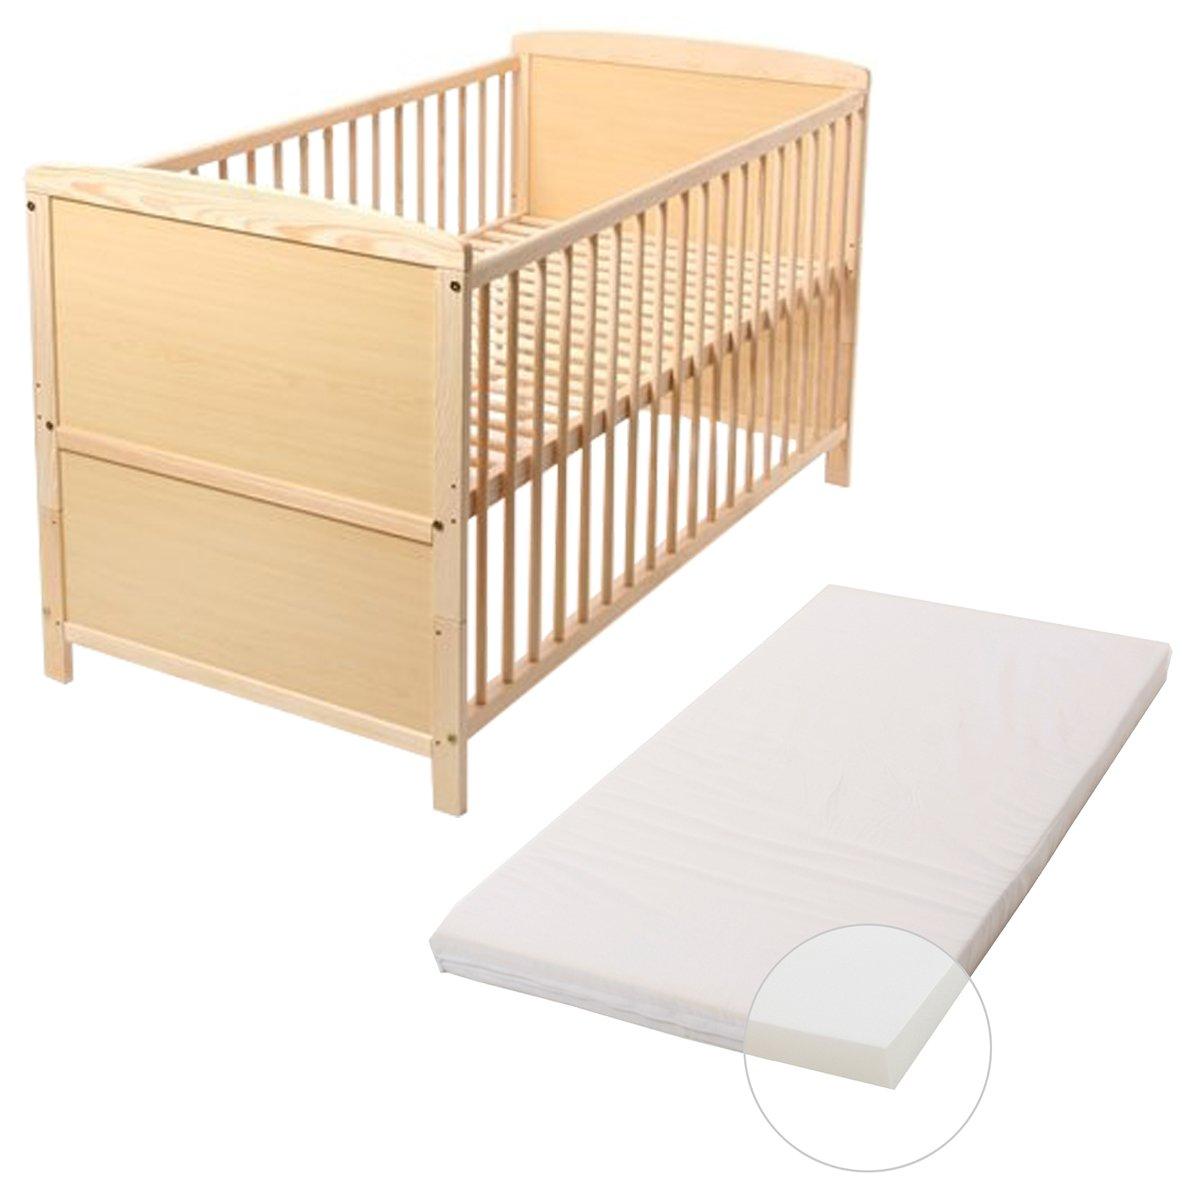 Baby- Kinder- und Jugend- Bett, Gitterbett, Kiefer teilmassiv, 140x70 cm, Babyblume TINA, Kiefer, inkl. Matratze BASIC